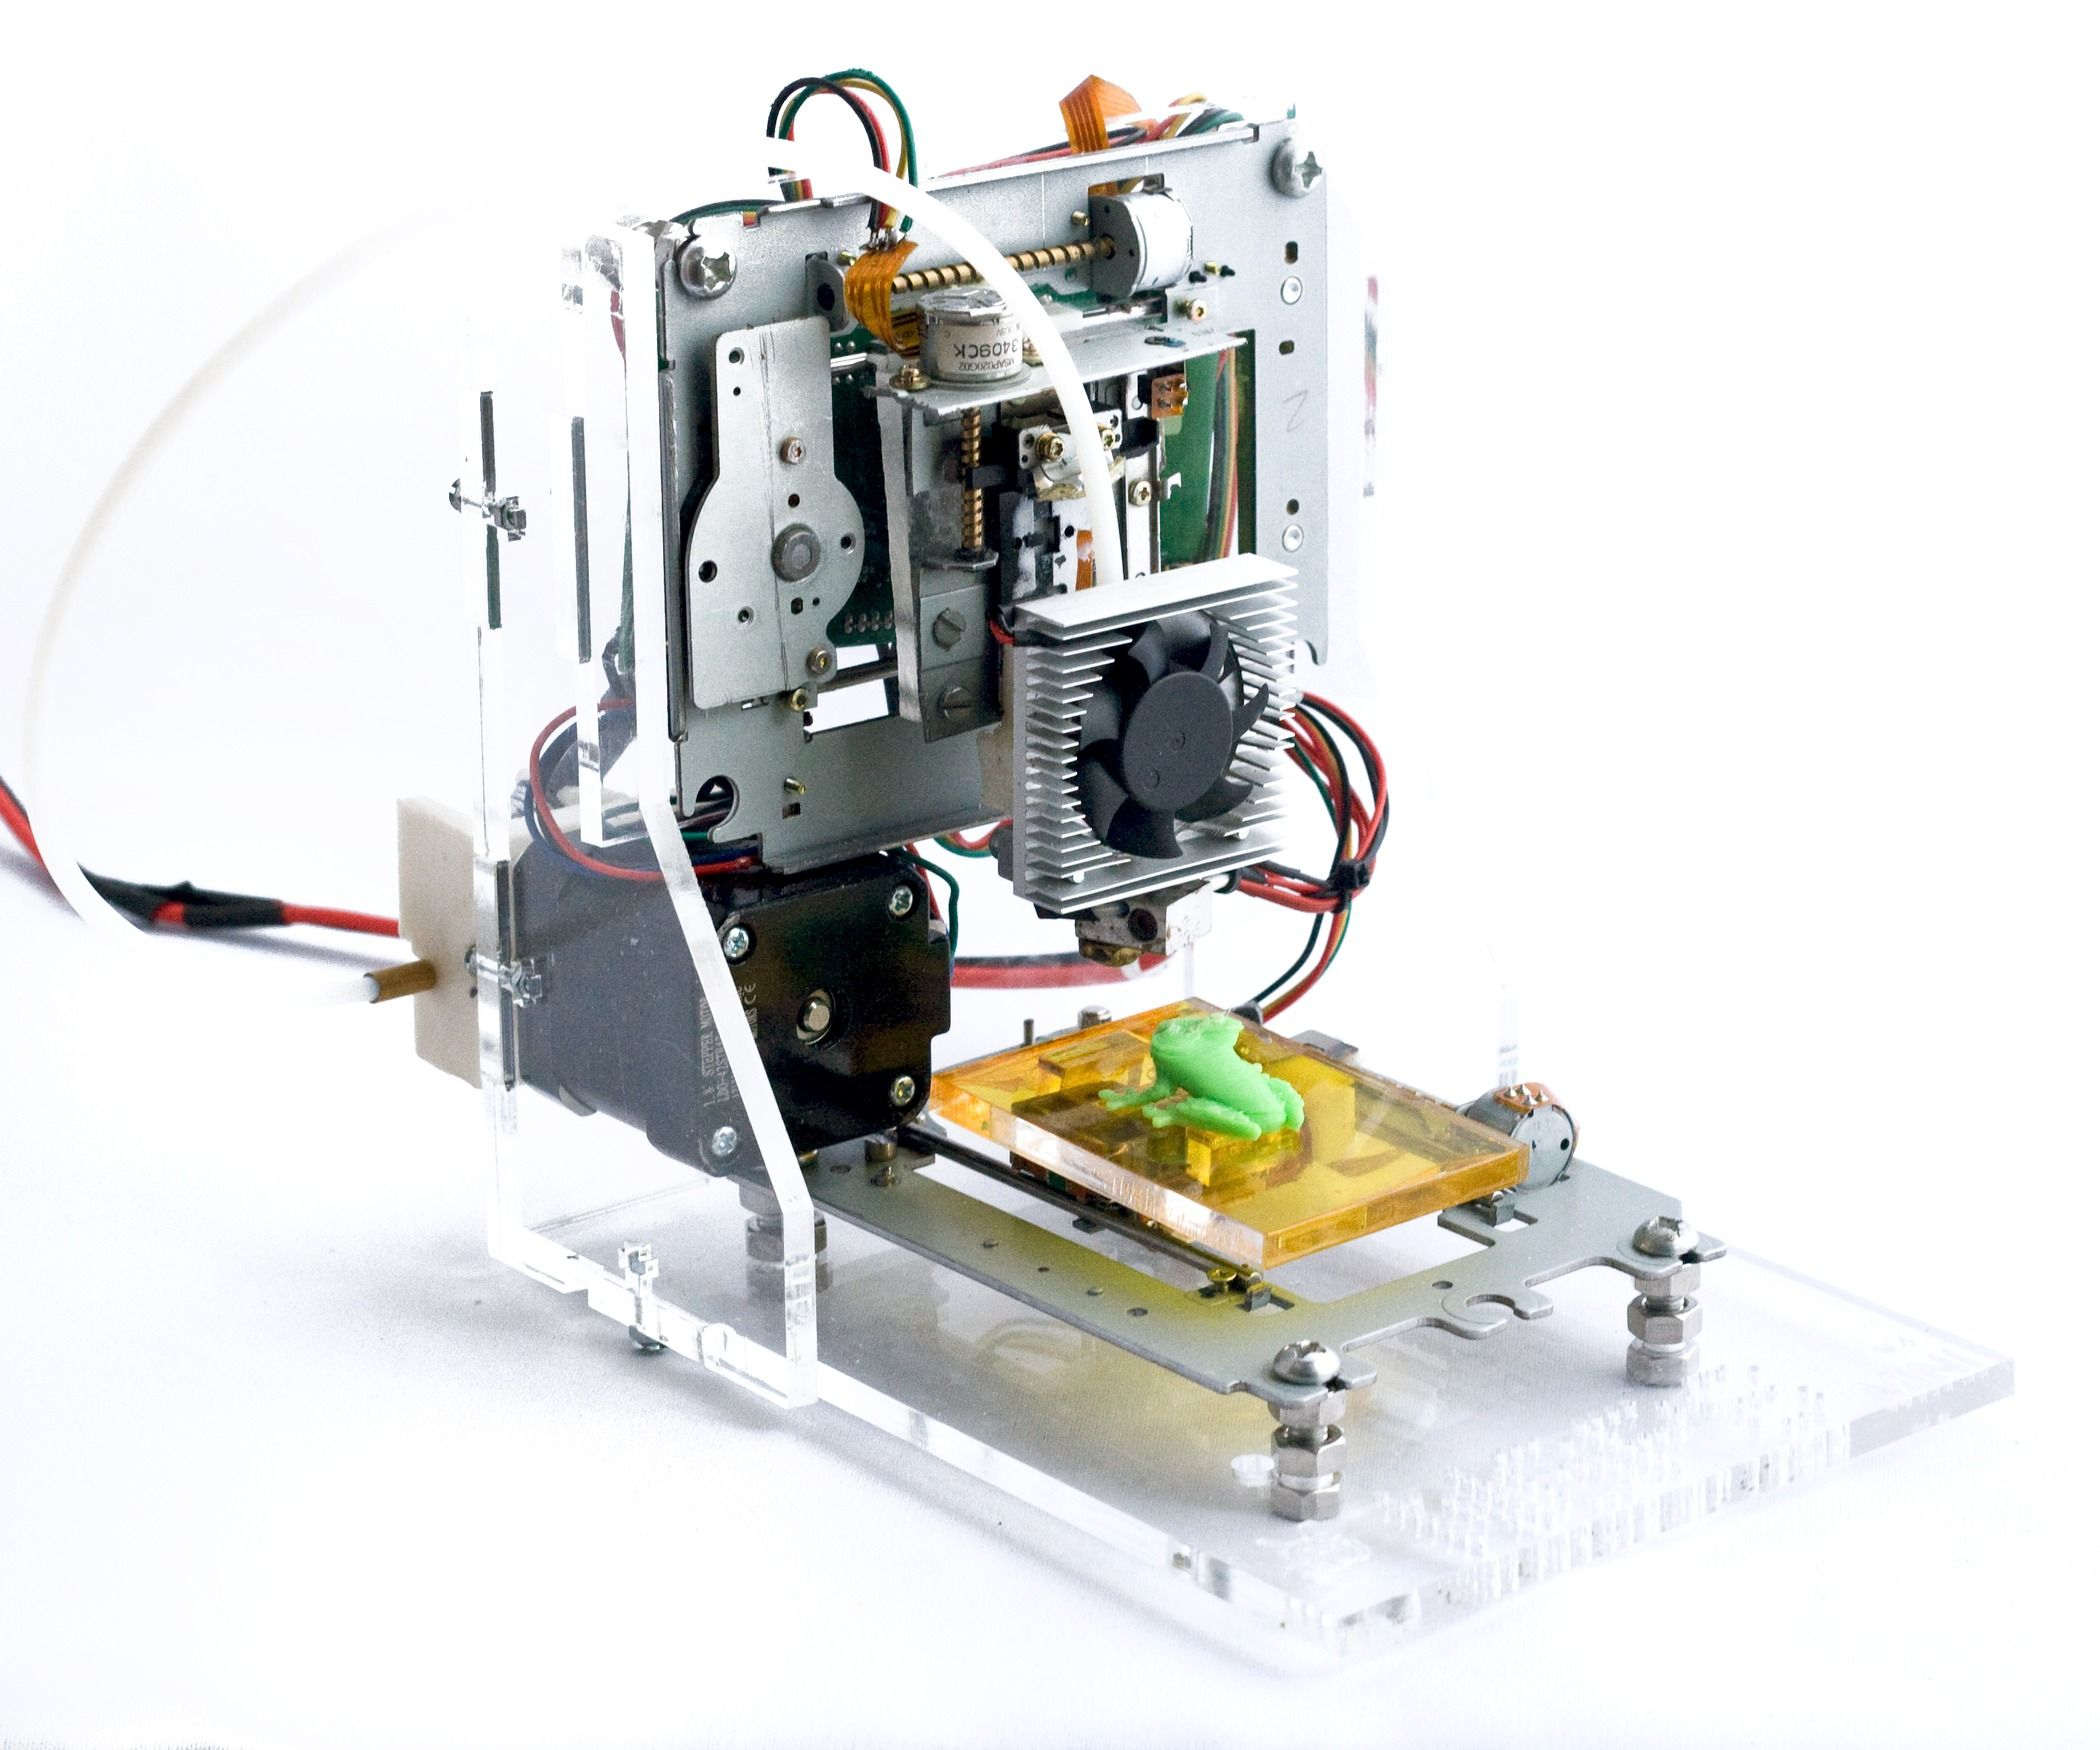 EWaste 60 3DPrinter Printer, 3d printing, 3d printer